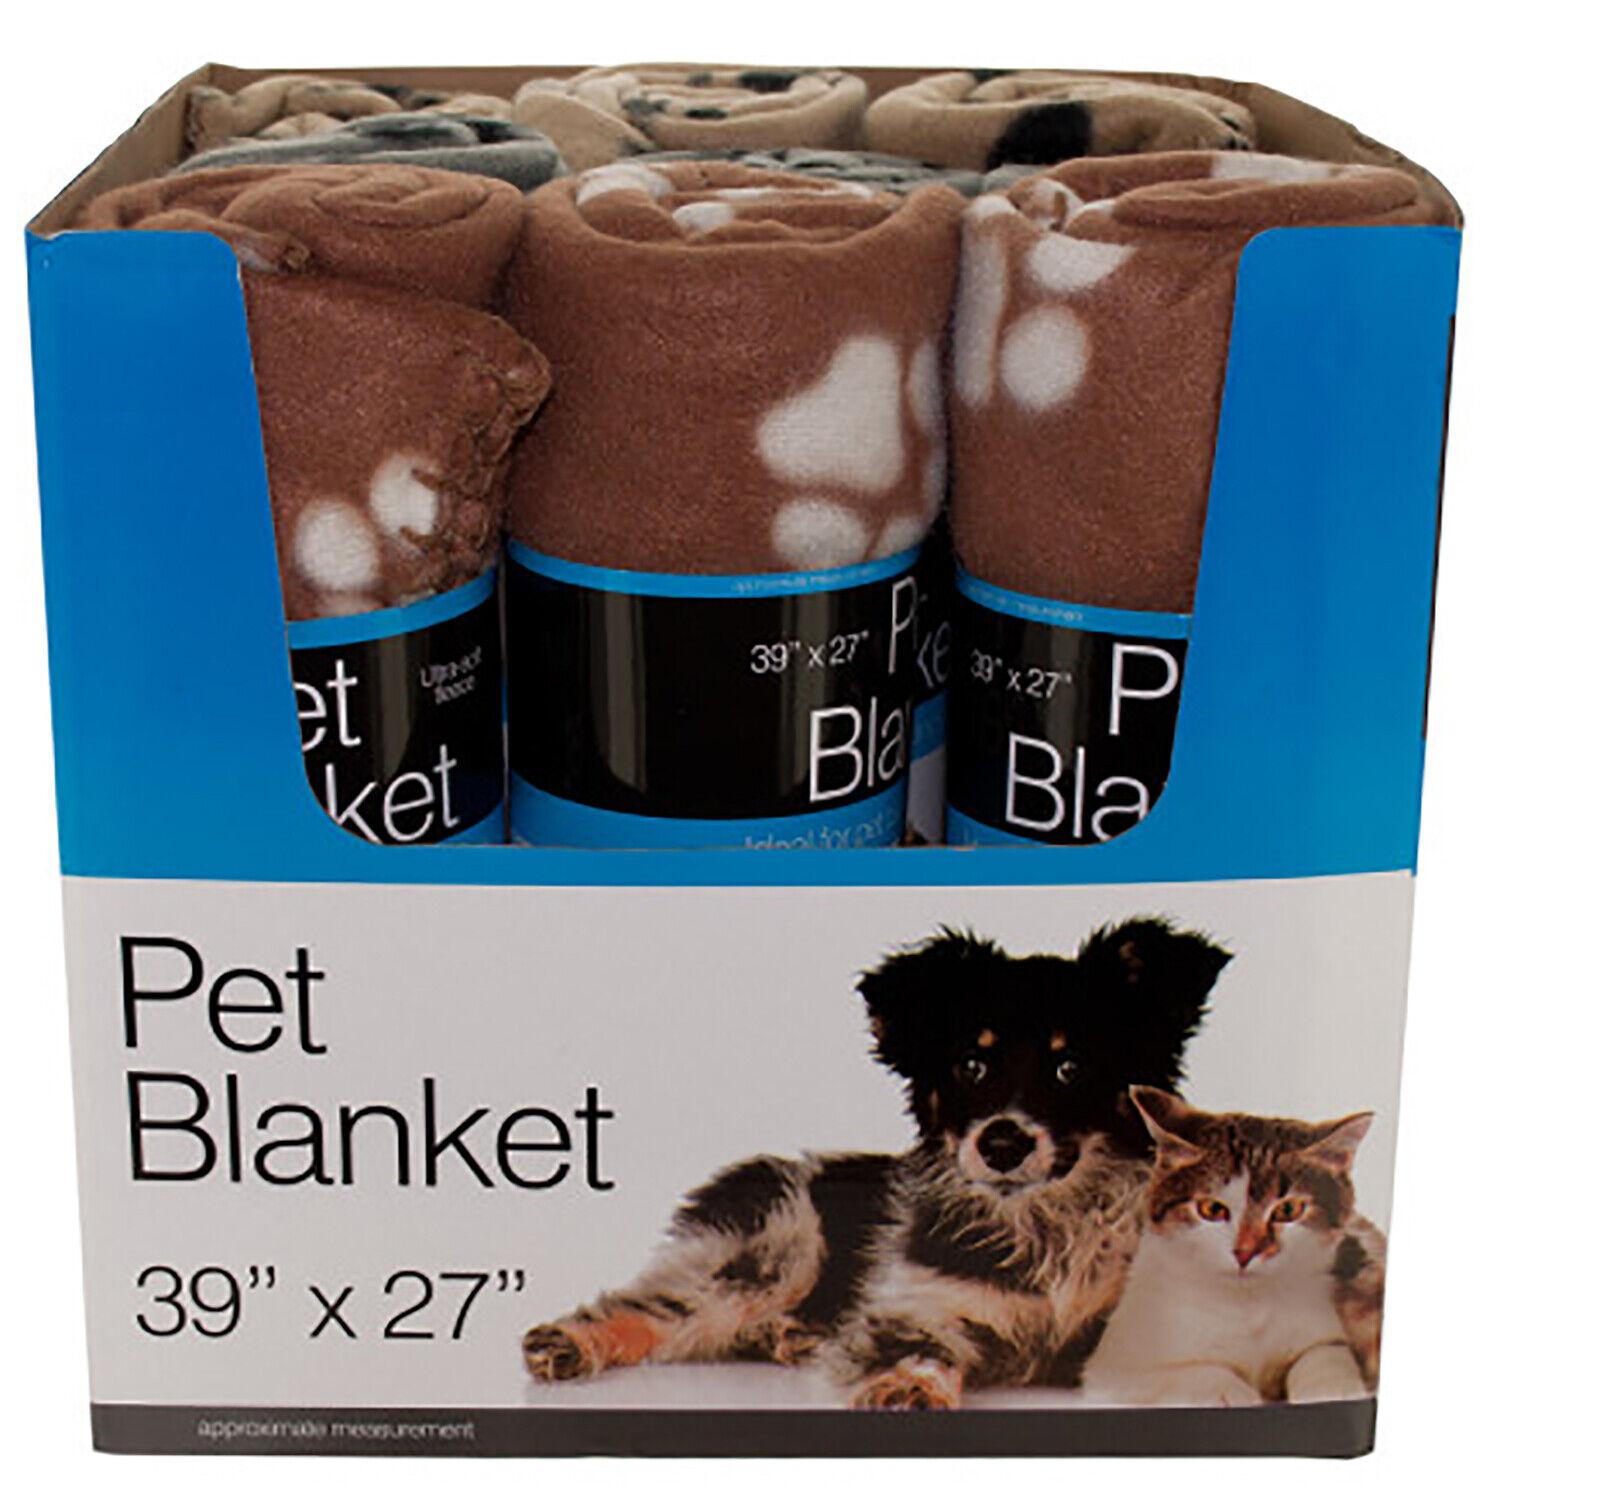 Paw Print Pet Blanket Soft Fleece 9pc Countertop Display Lot of 18 Ship Free